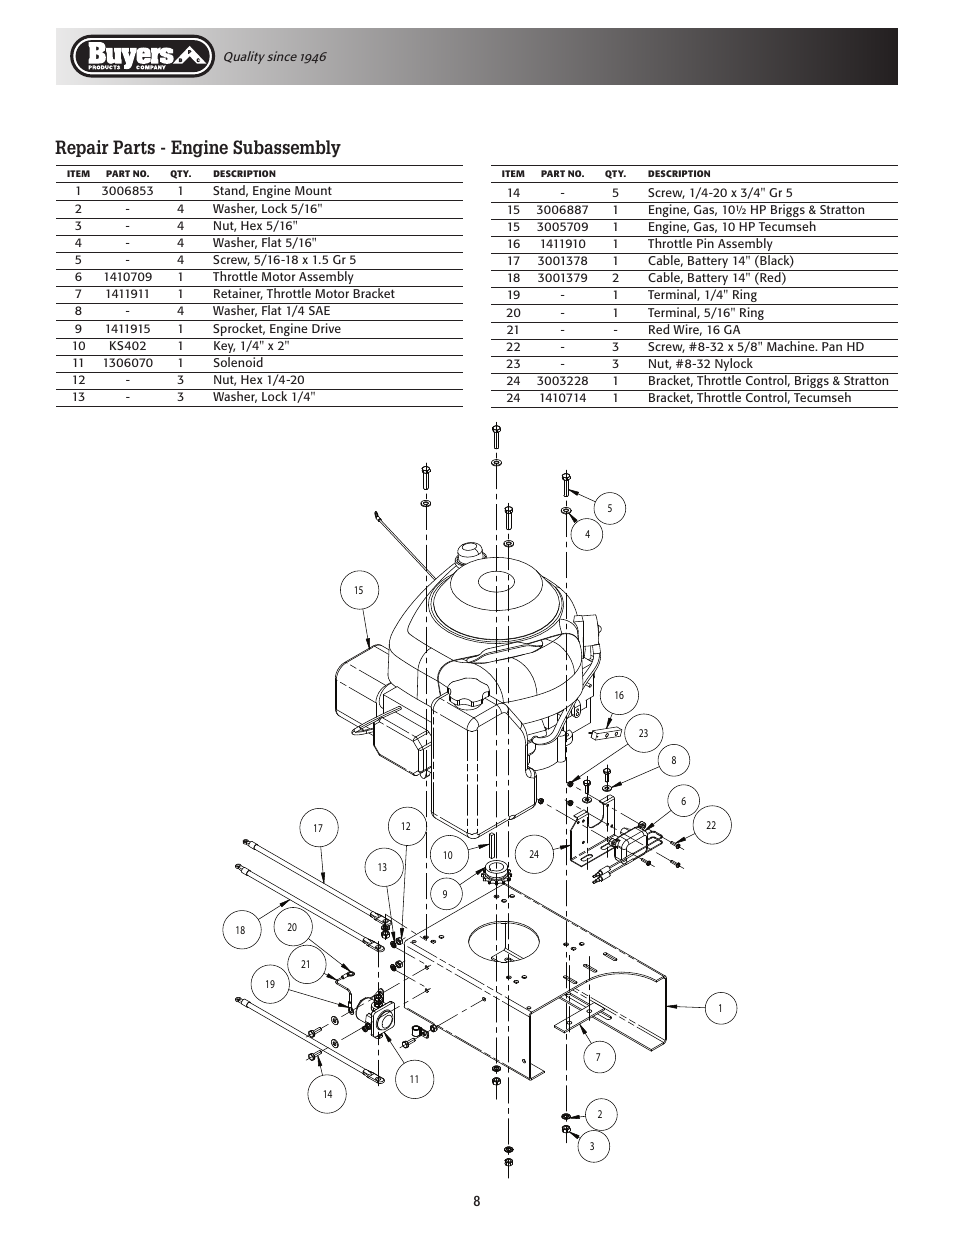 Buyer Throttle Control Diagram Wiring Schematics Salt Dogg Controller Repair Parts Engine Subassembly Saltdogg Sch 1400 Series Self Collective